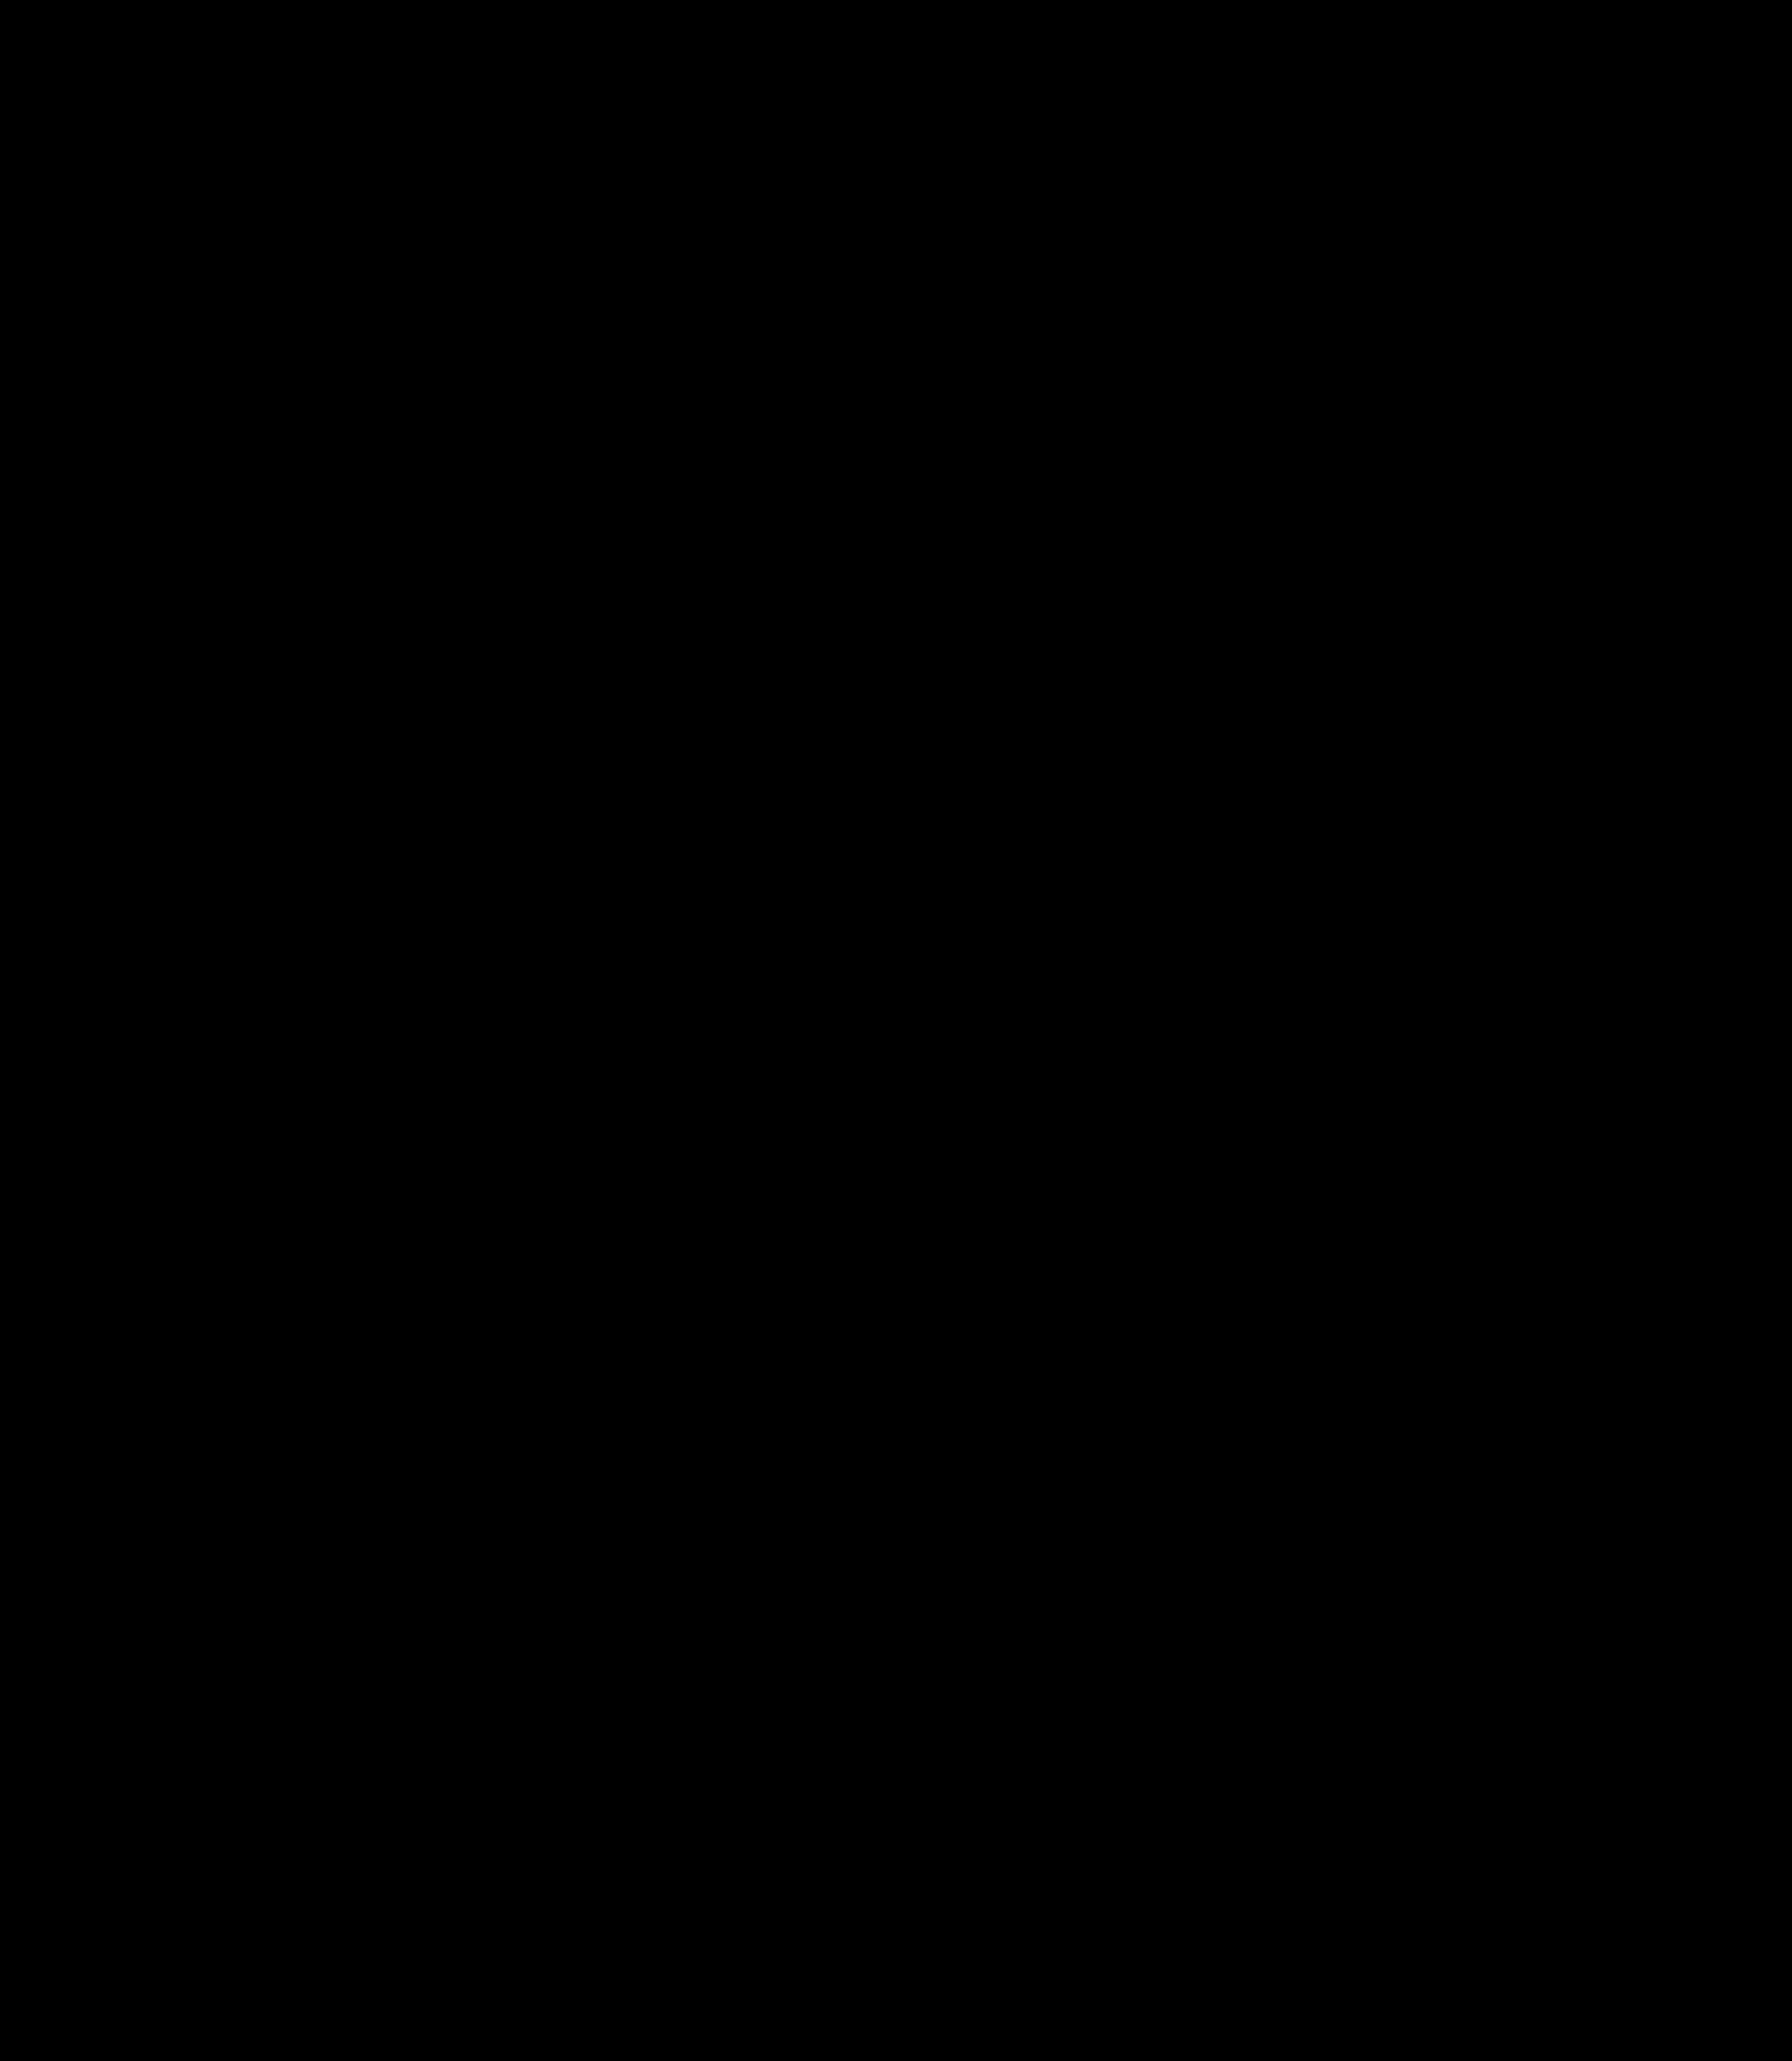 Castle logo vector clipart jpg stock Castle logo vector clipart - ClipartFest jpg stock